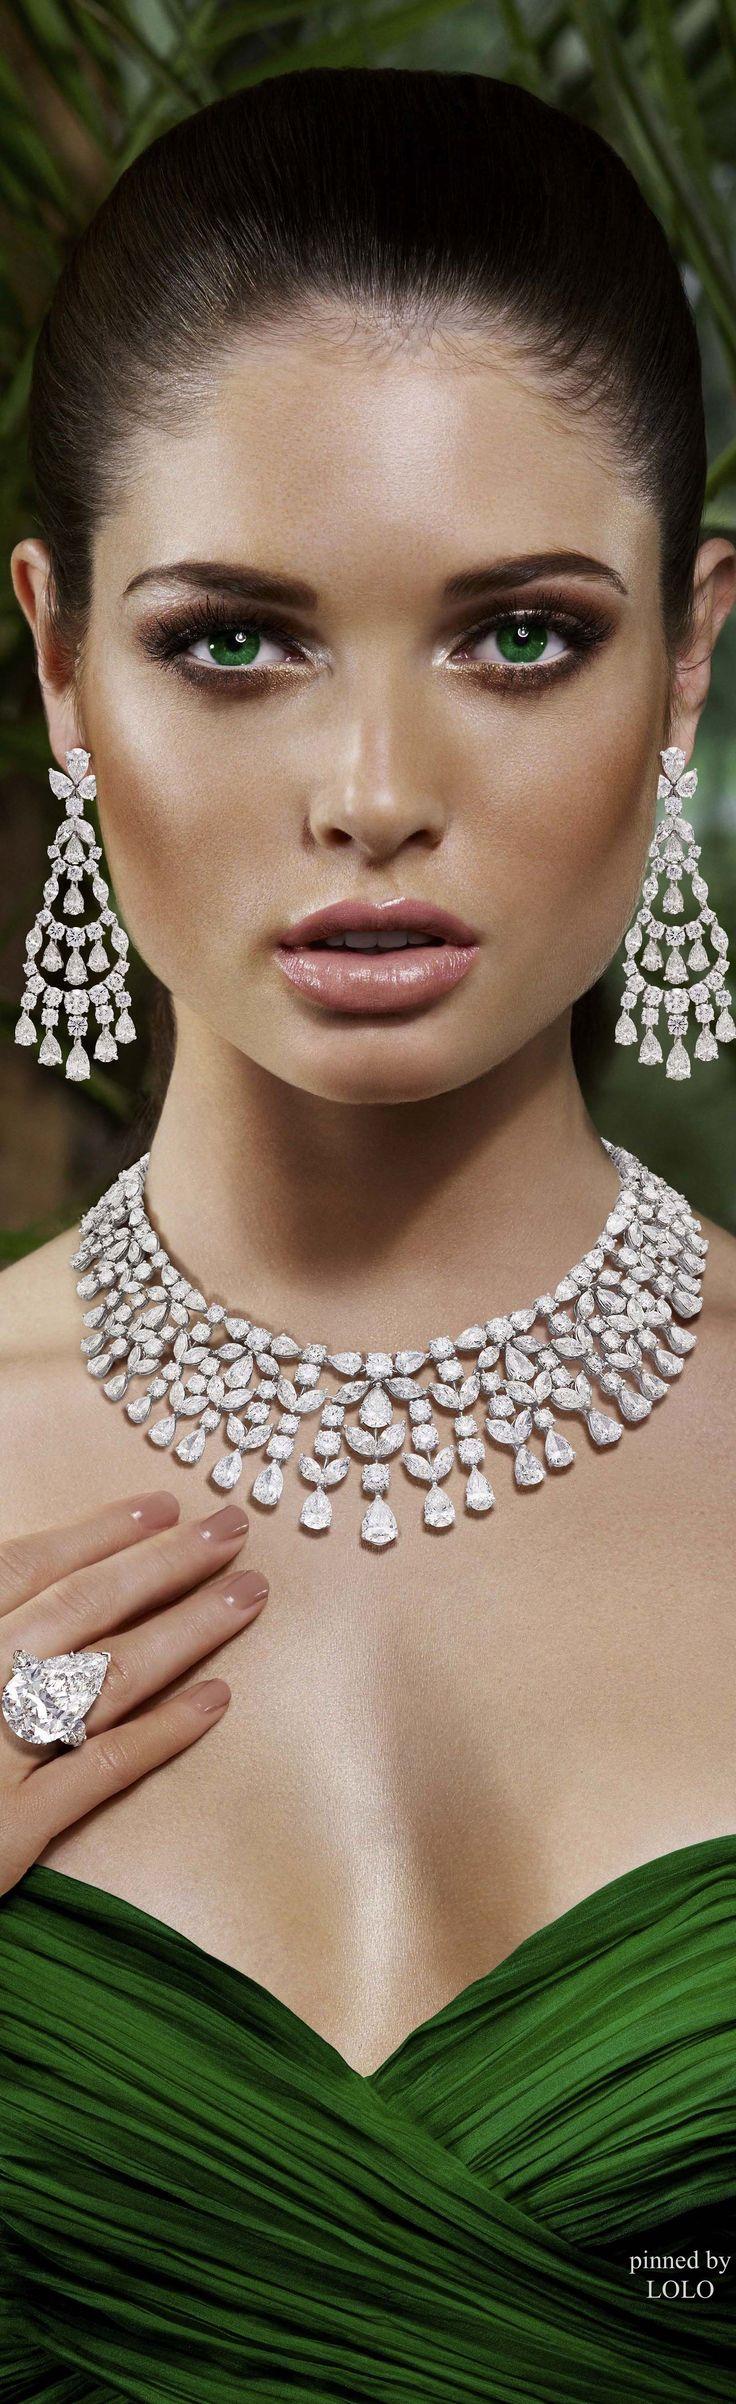 Graff Diamonds @}-,-;--is it true diamonds are a girl's best friend? Looks pretty good to me!